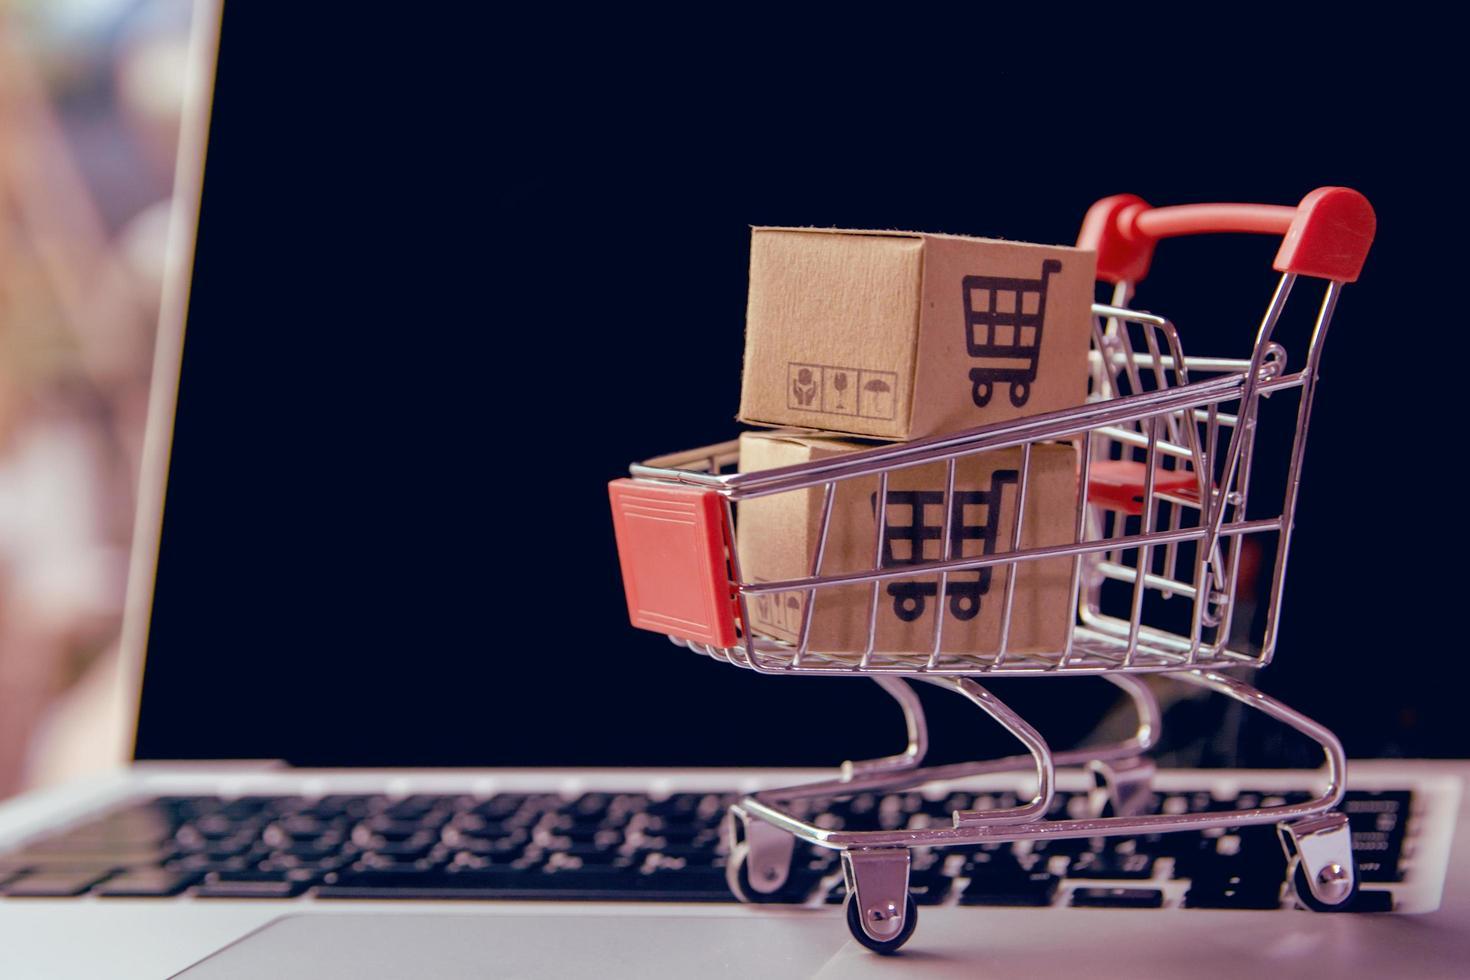 primer plano de carrito de compras en miniatura en la computadora portátil foto